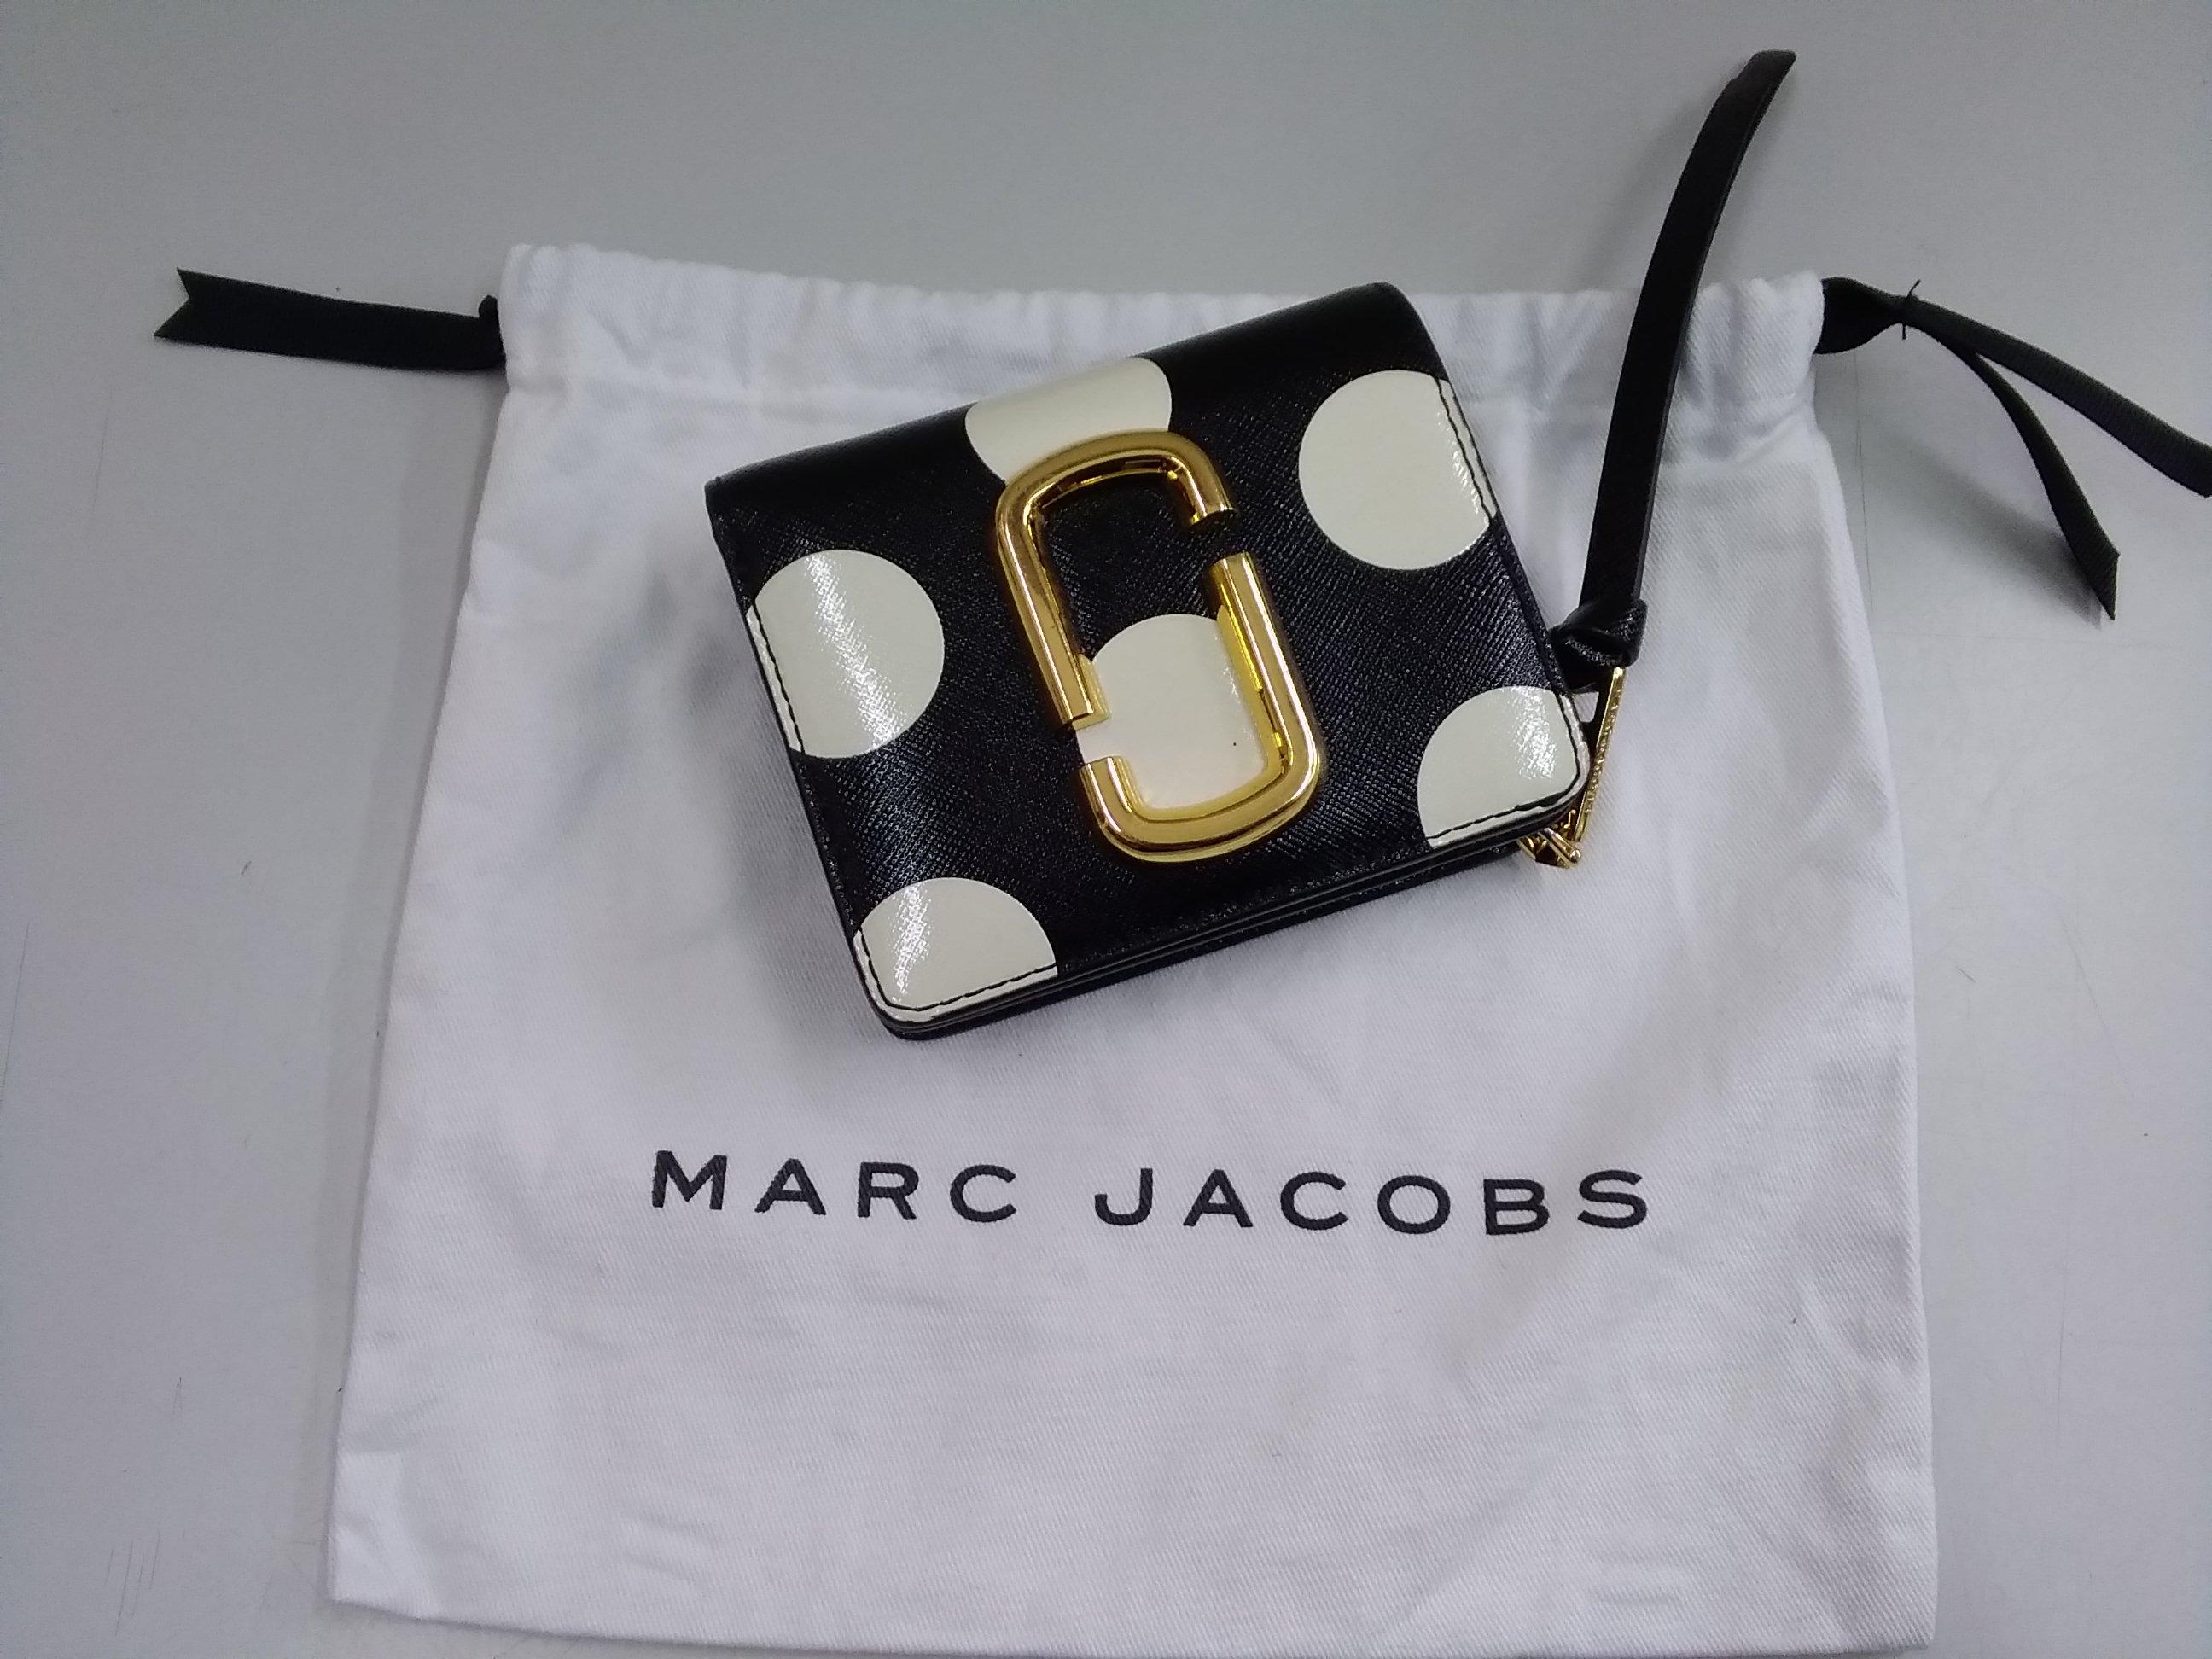 MARC JACOBS ドット柄 折り財布|MARC JACOBS